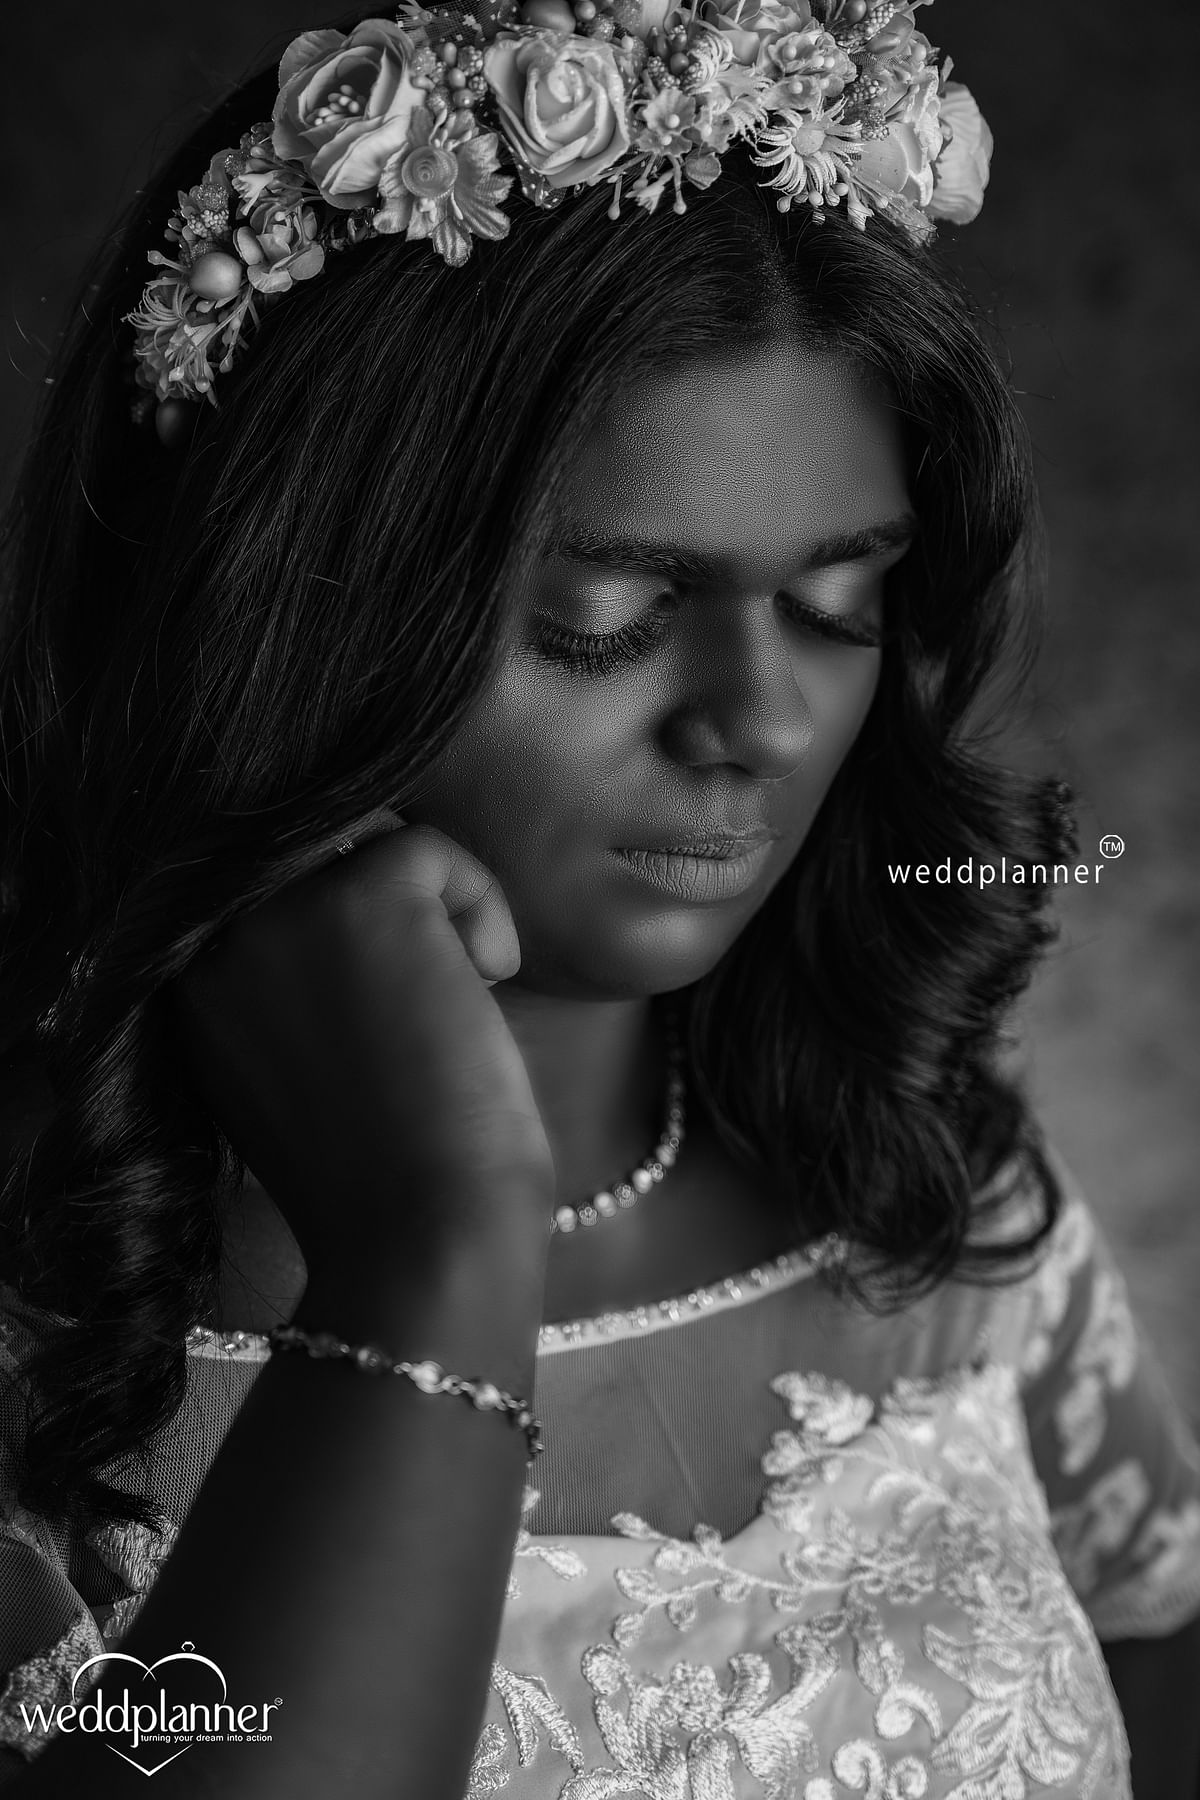 Kajal Janith in the Le Beaute photoshoot